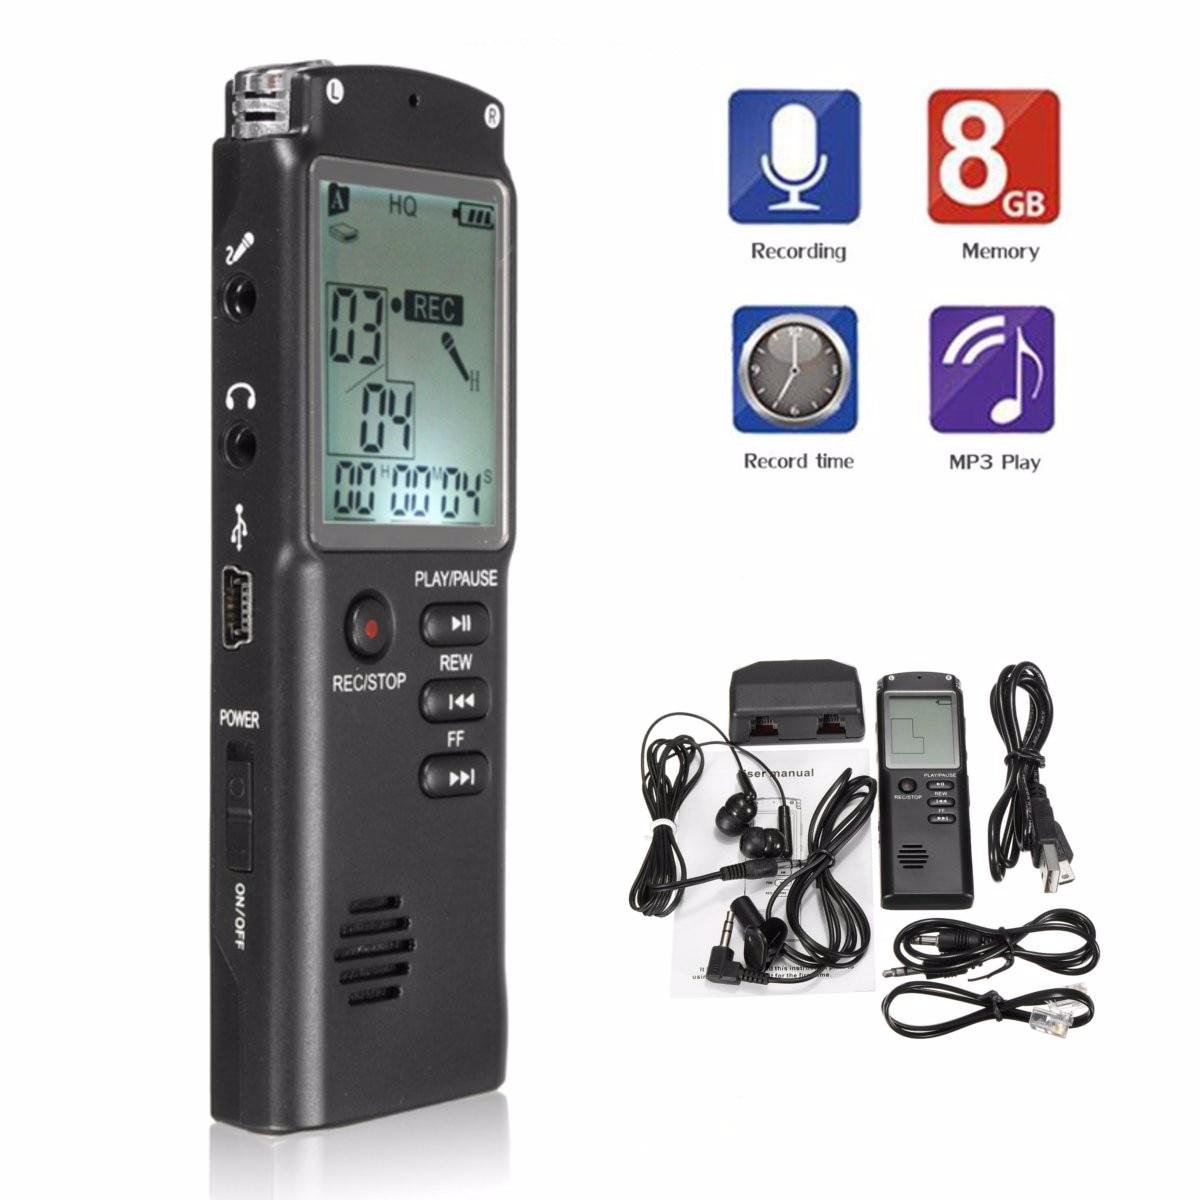 Leory Voice Recorder Usb Professional 8g Digital Voice Recorder Lcd Bildschirm Zwei-weg Mikrofon Sound Aufnahme Lärm Reduktion Digital Voice Recorder Unterhaltungselektronik